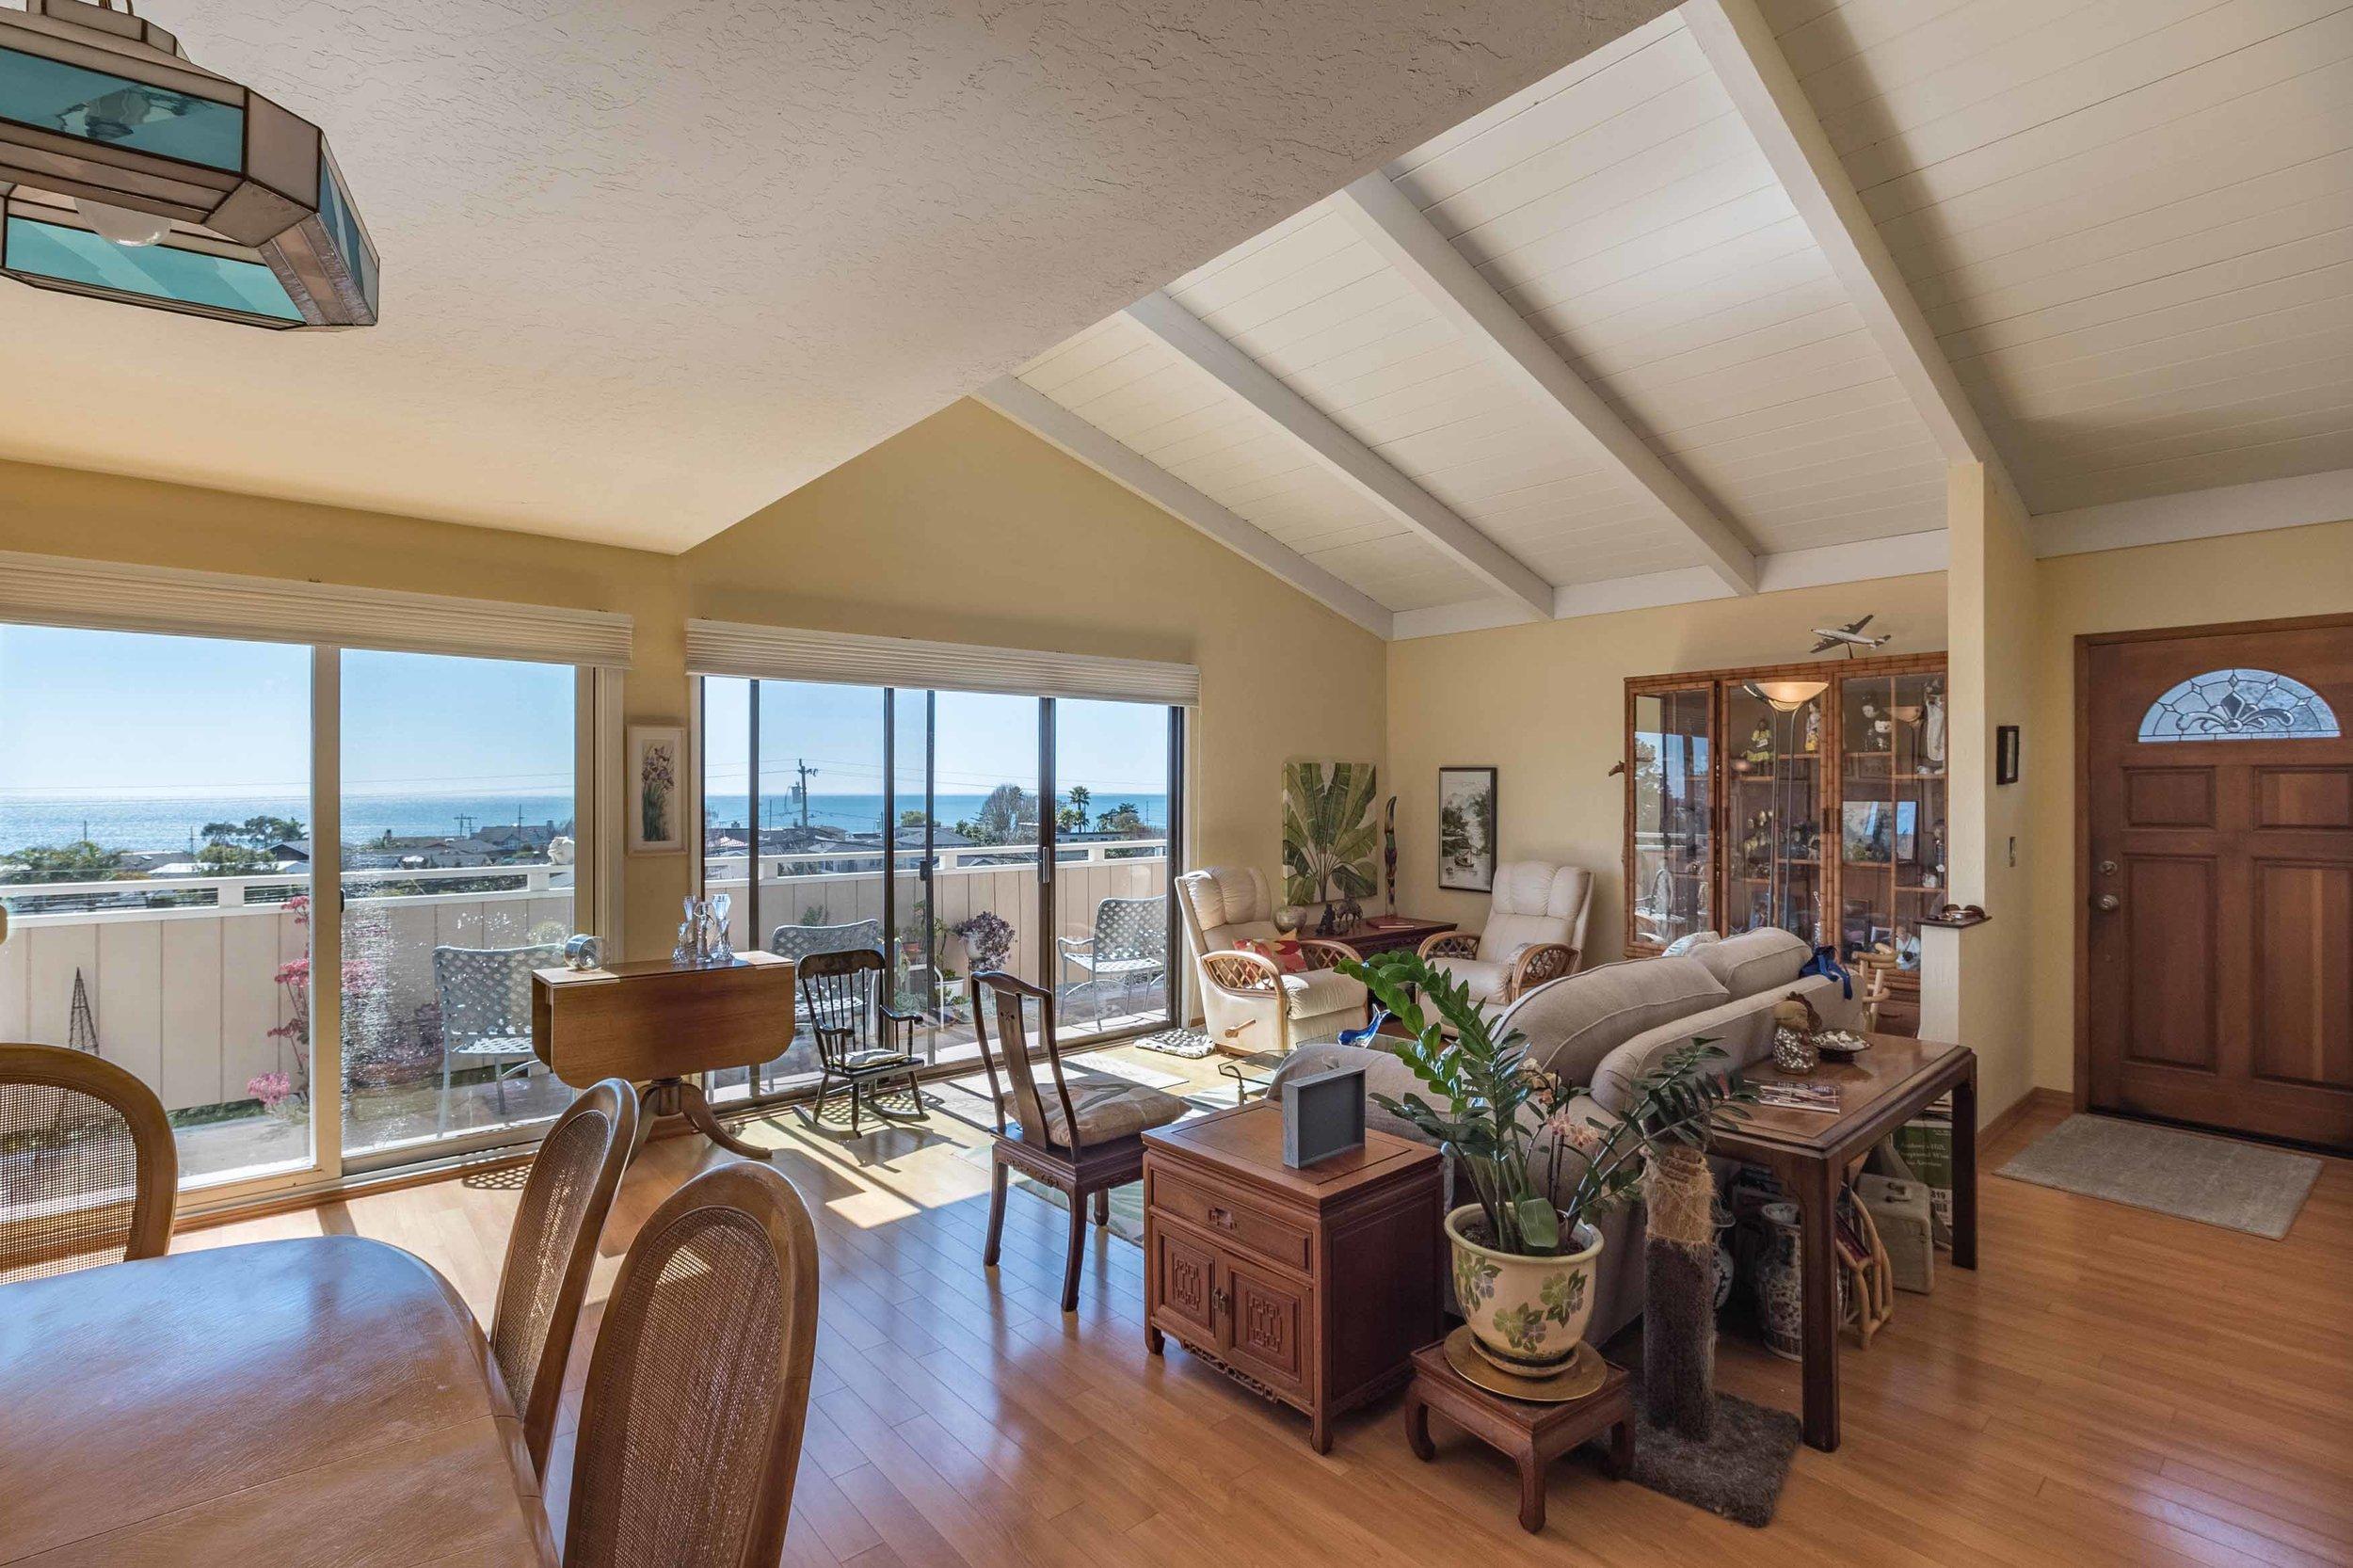 SOLD 261 Sea Ridge Road #4, Aptos • $759,000  3 Bedroom • 2 Bathroom • 1,548 Sq. Ft.